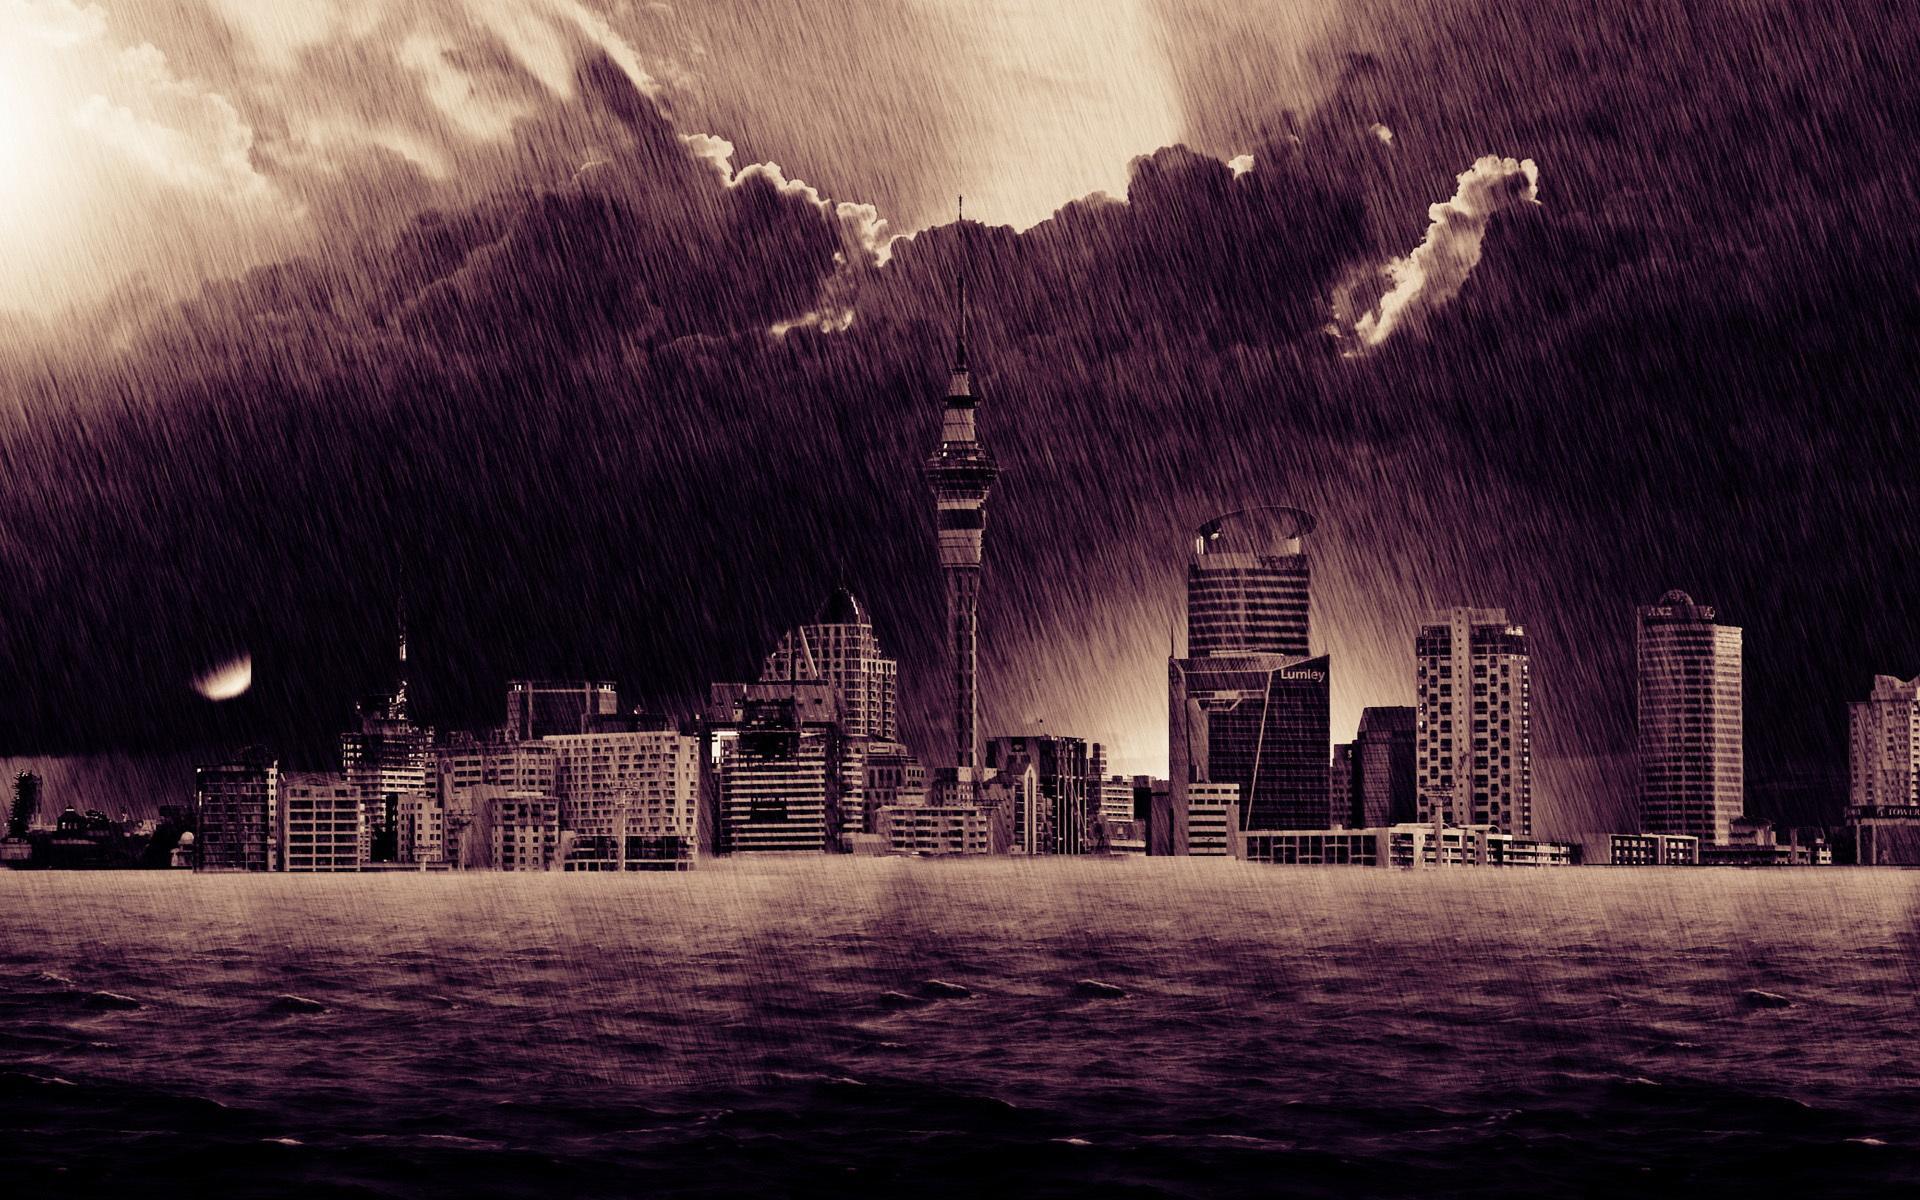 Rain City Wallpaper images of large rain city wallpaper - #sc